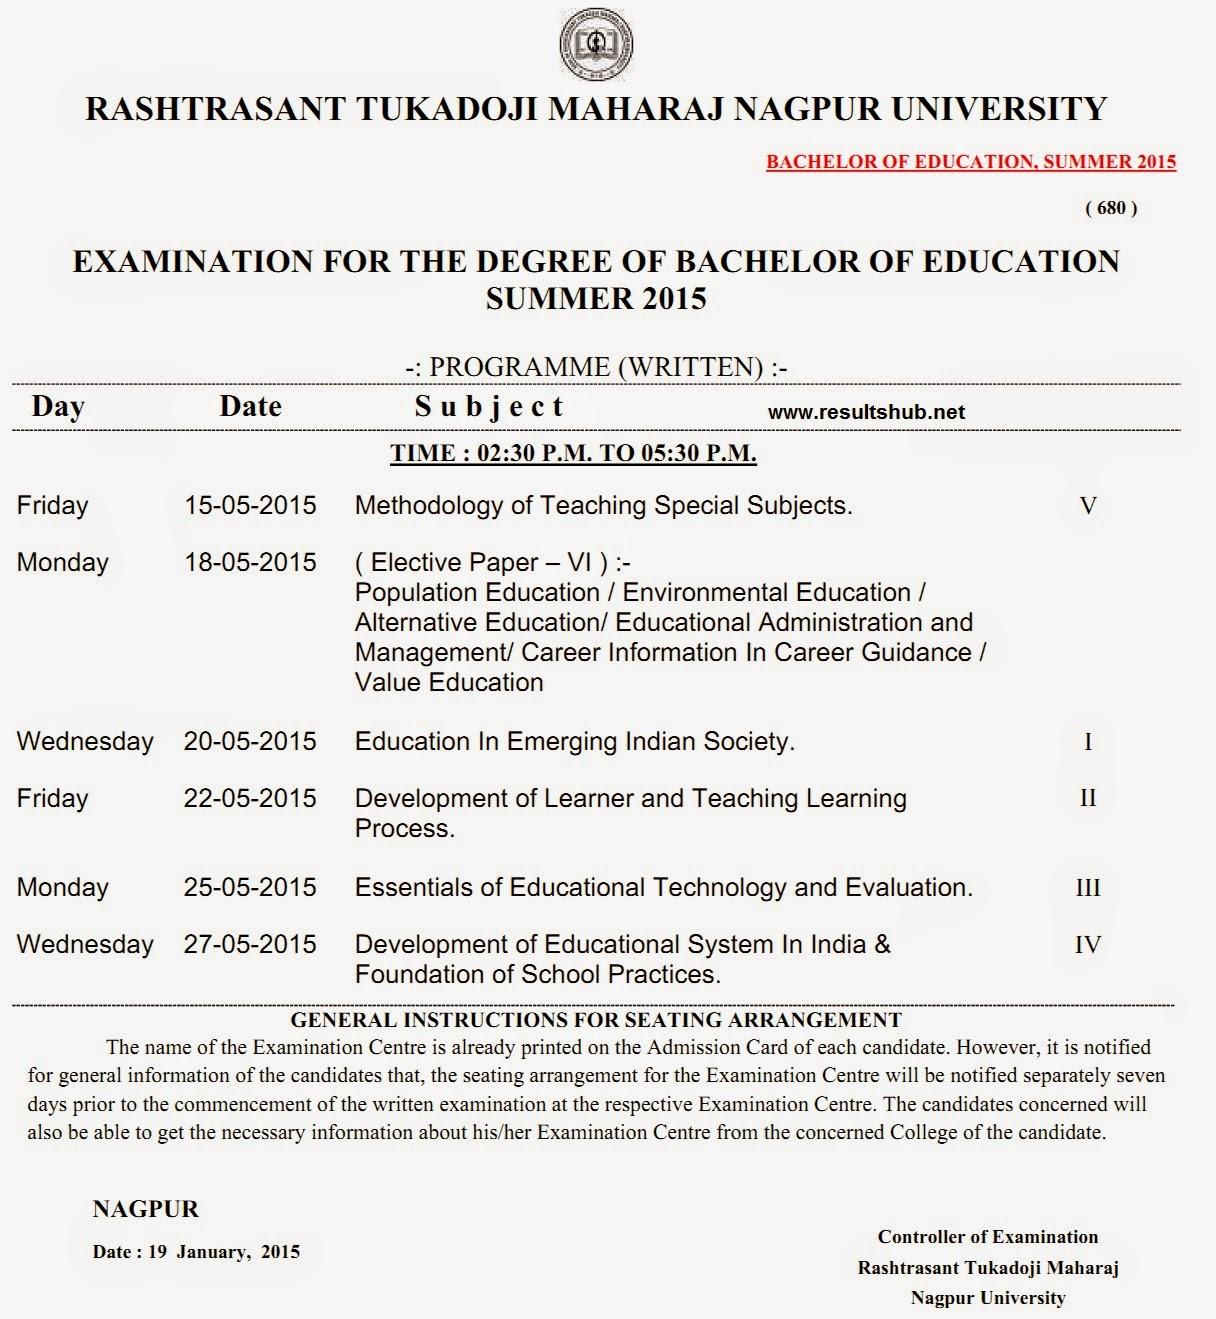 B.Ed. Summer 2015 Timetable Nagpur University